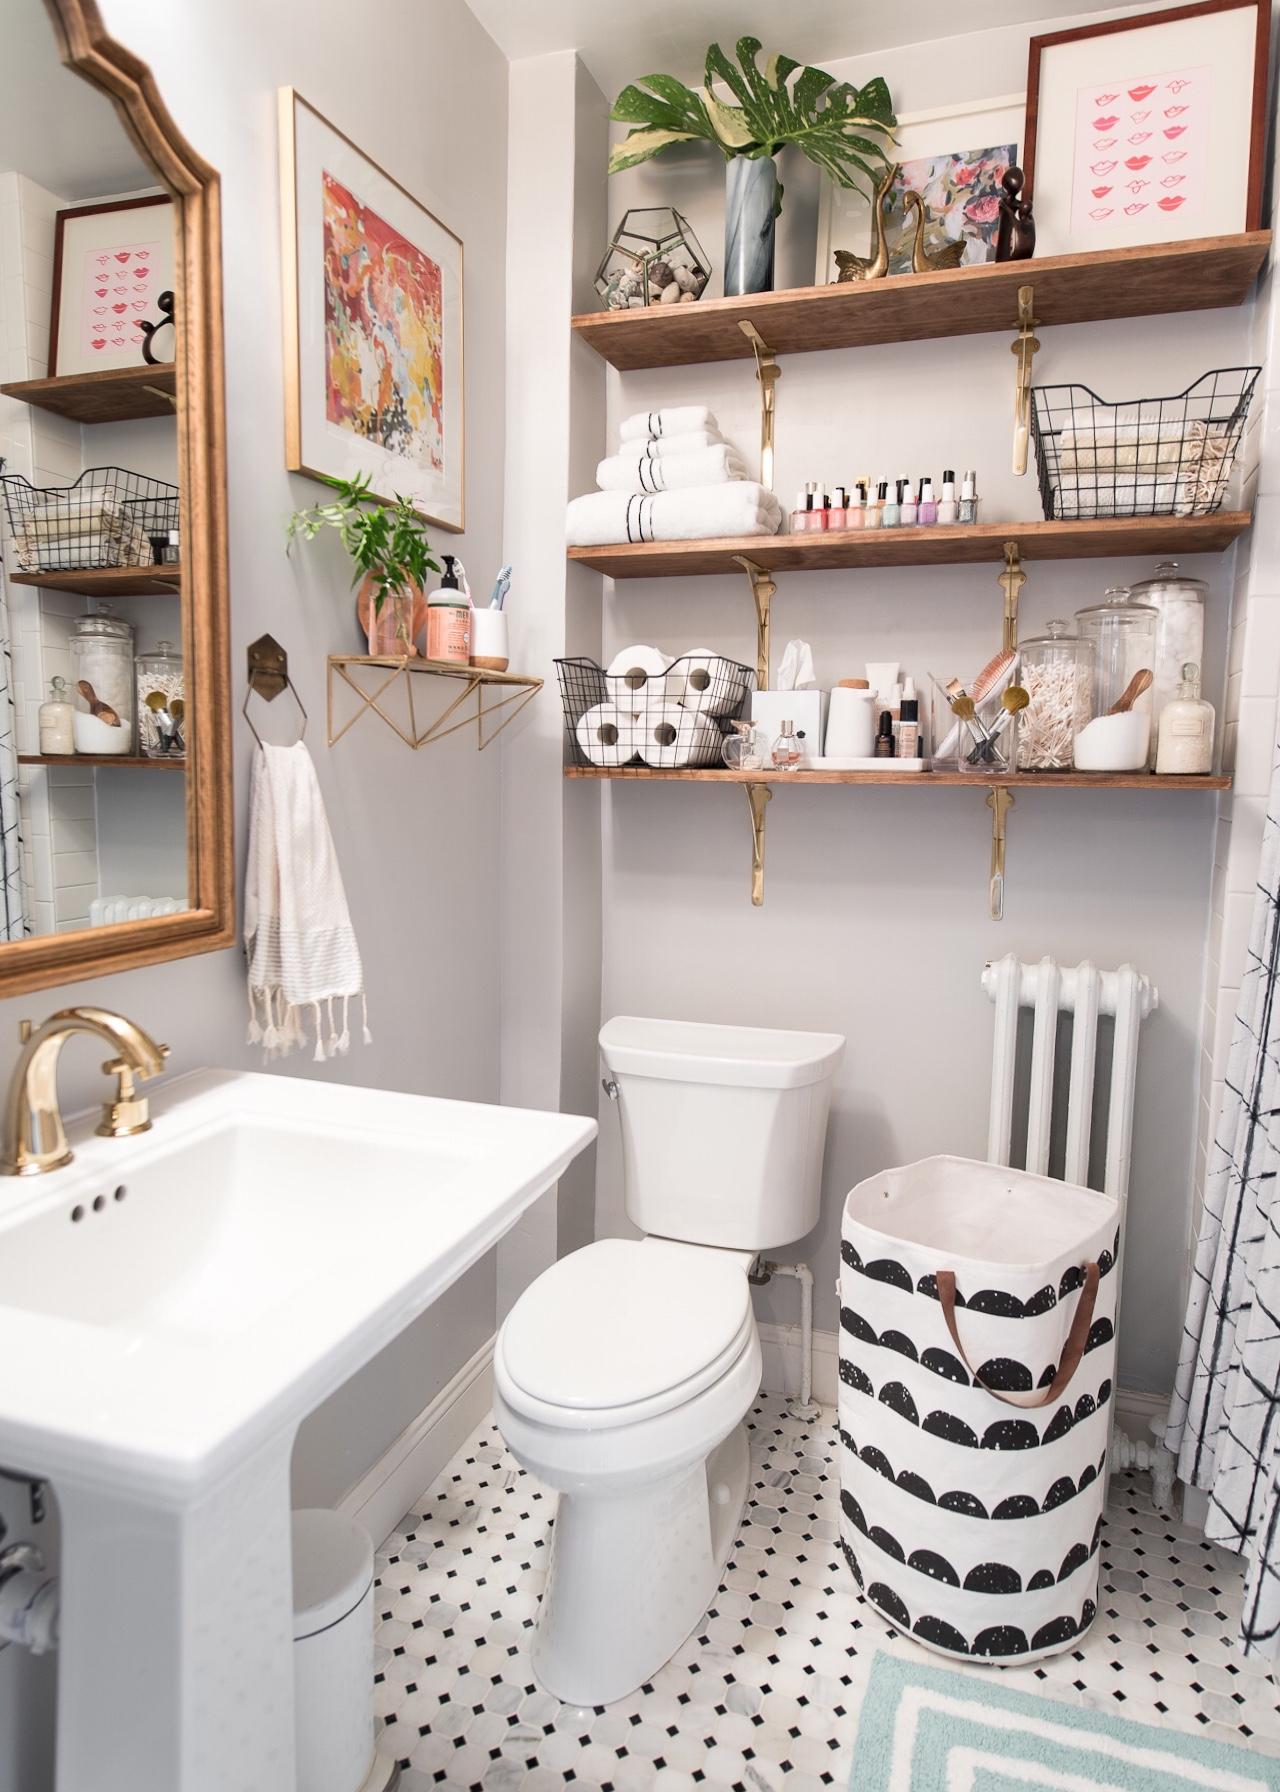 1920s-inspired Classic Small Bathroom on Small Apartment Bathroom Ideas  id=57607